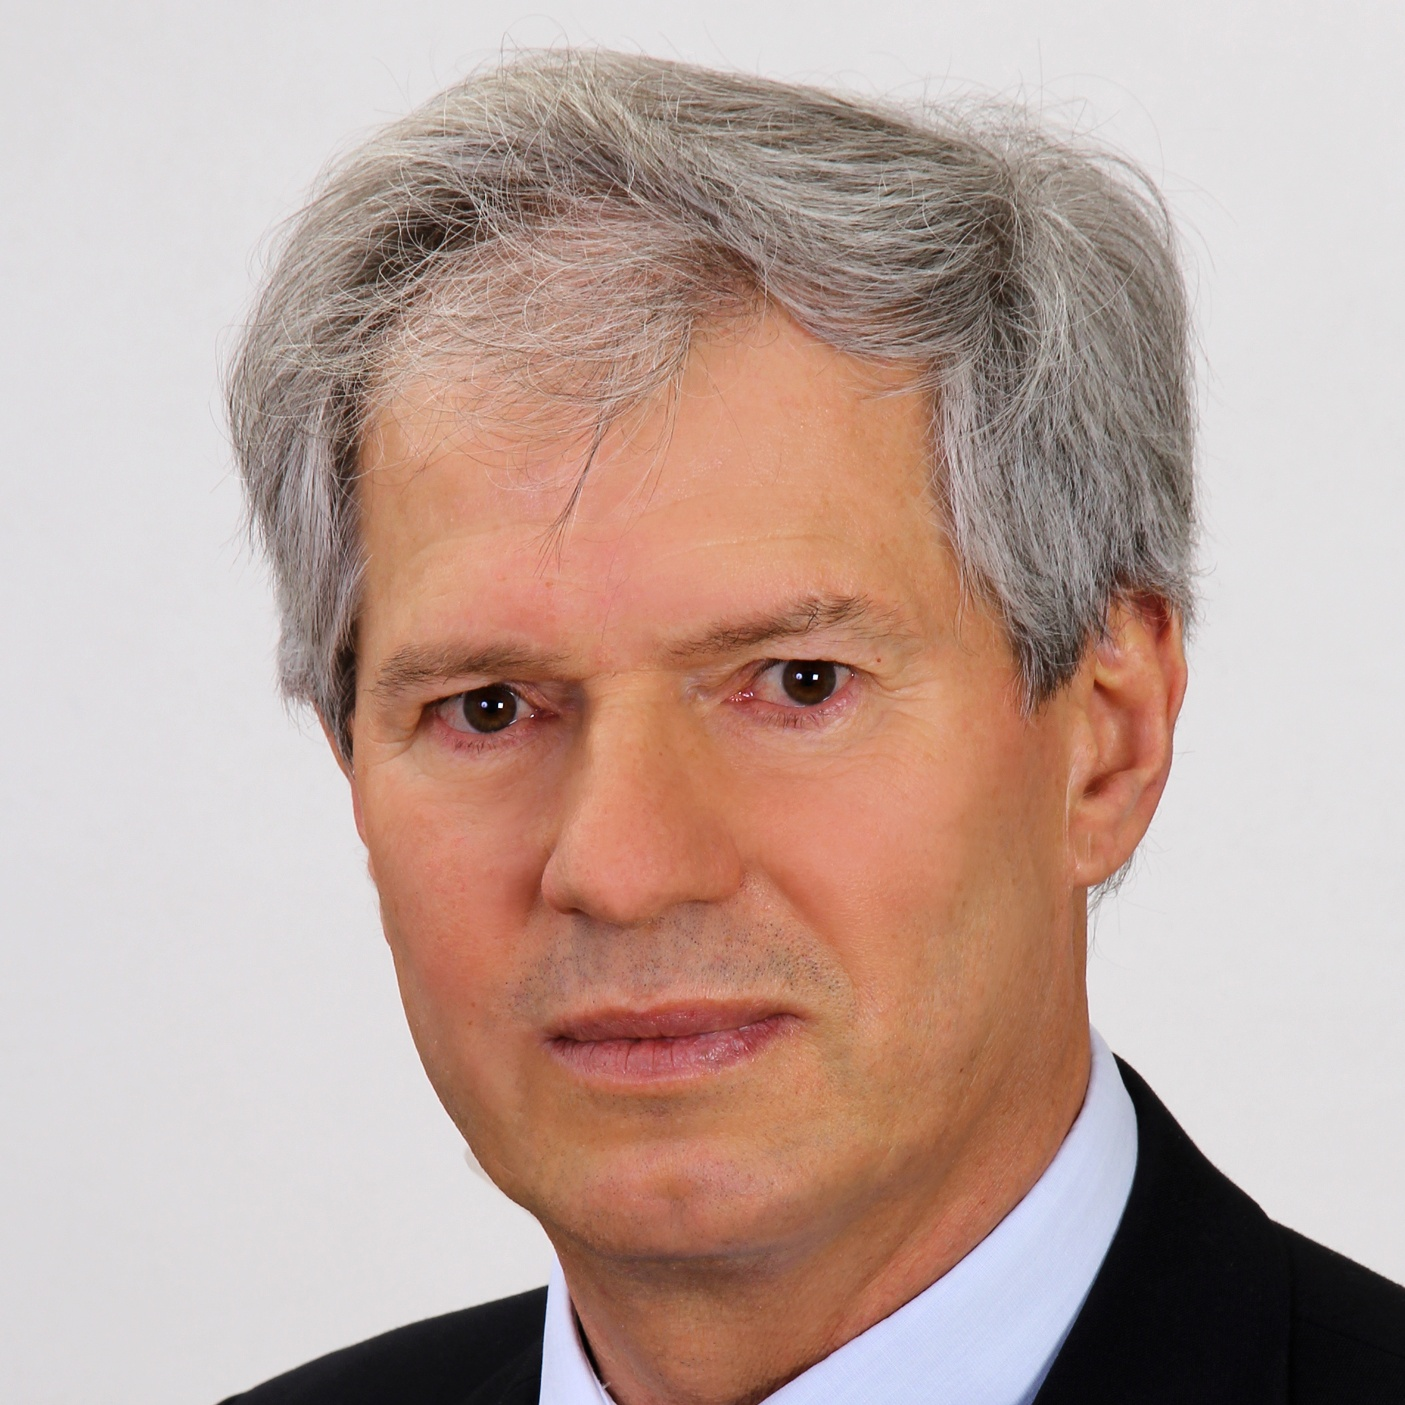 doc. RNDr. Alfonz Gajdoš, PhD.